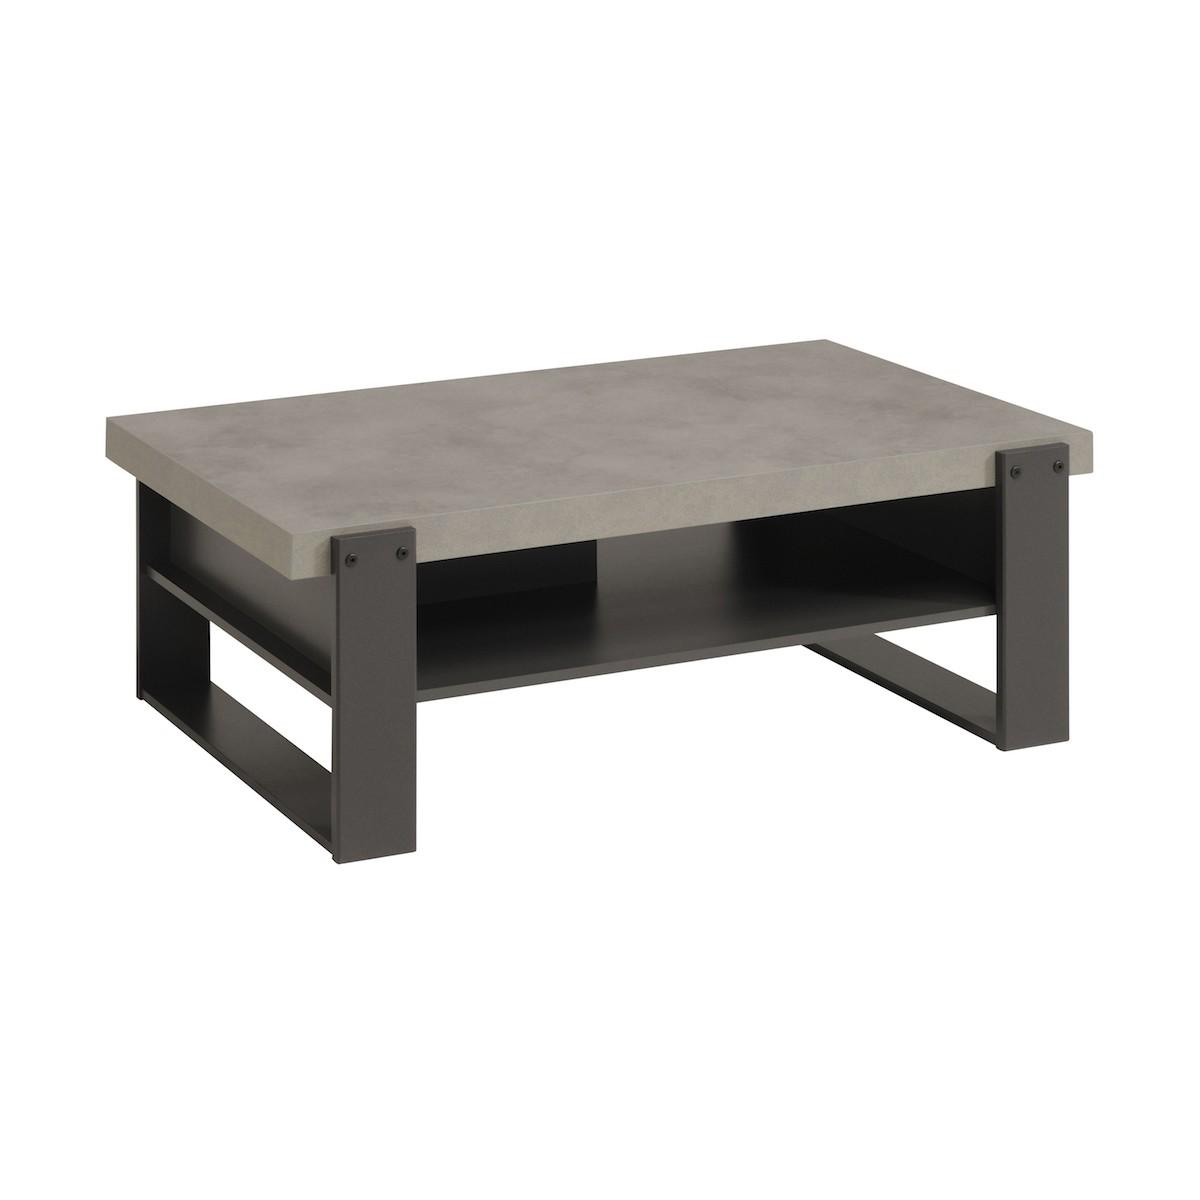 geringe industrielle eleanor holztisch klar graue schatten beton amp story 5843